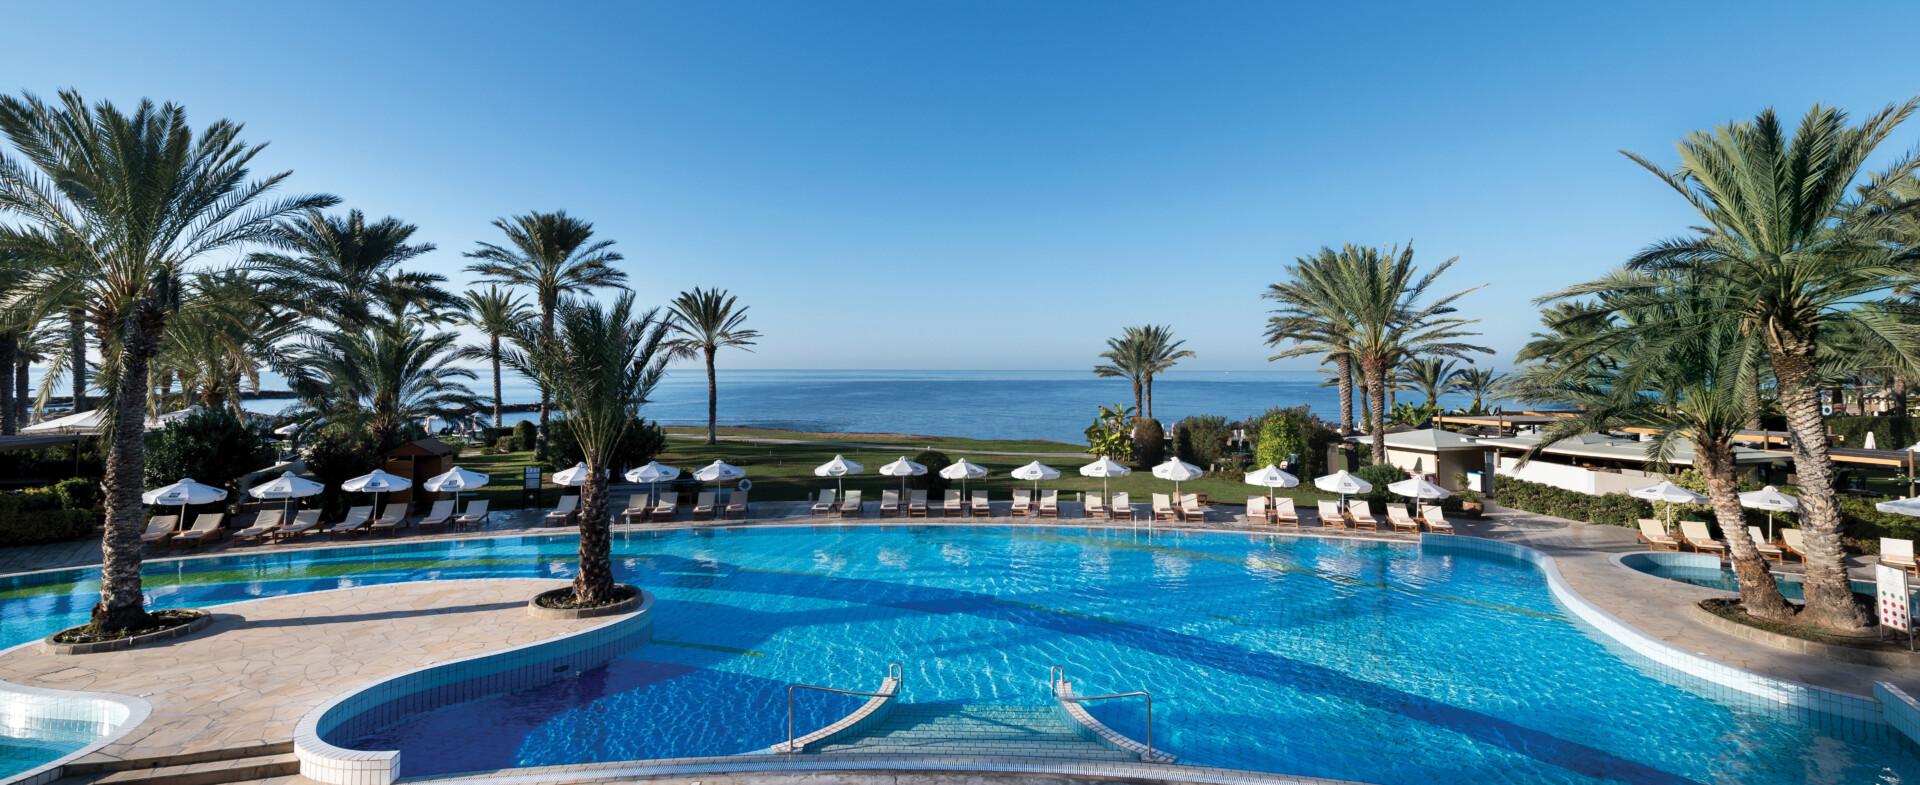 3 ATHENA BEACH HOTEL POOL AND SEA VIEW